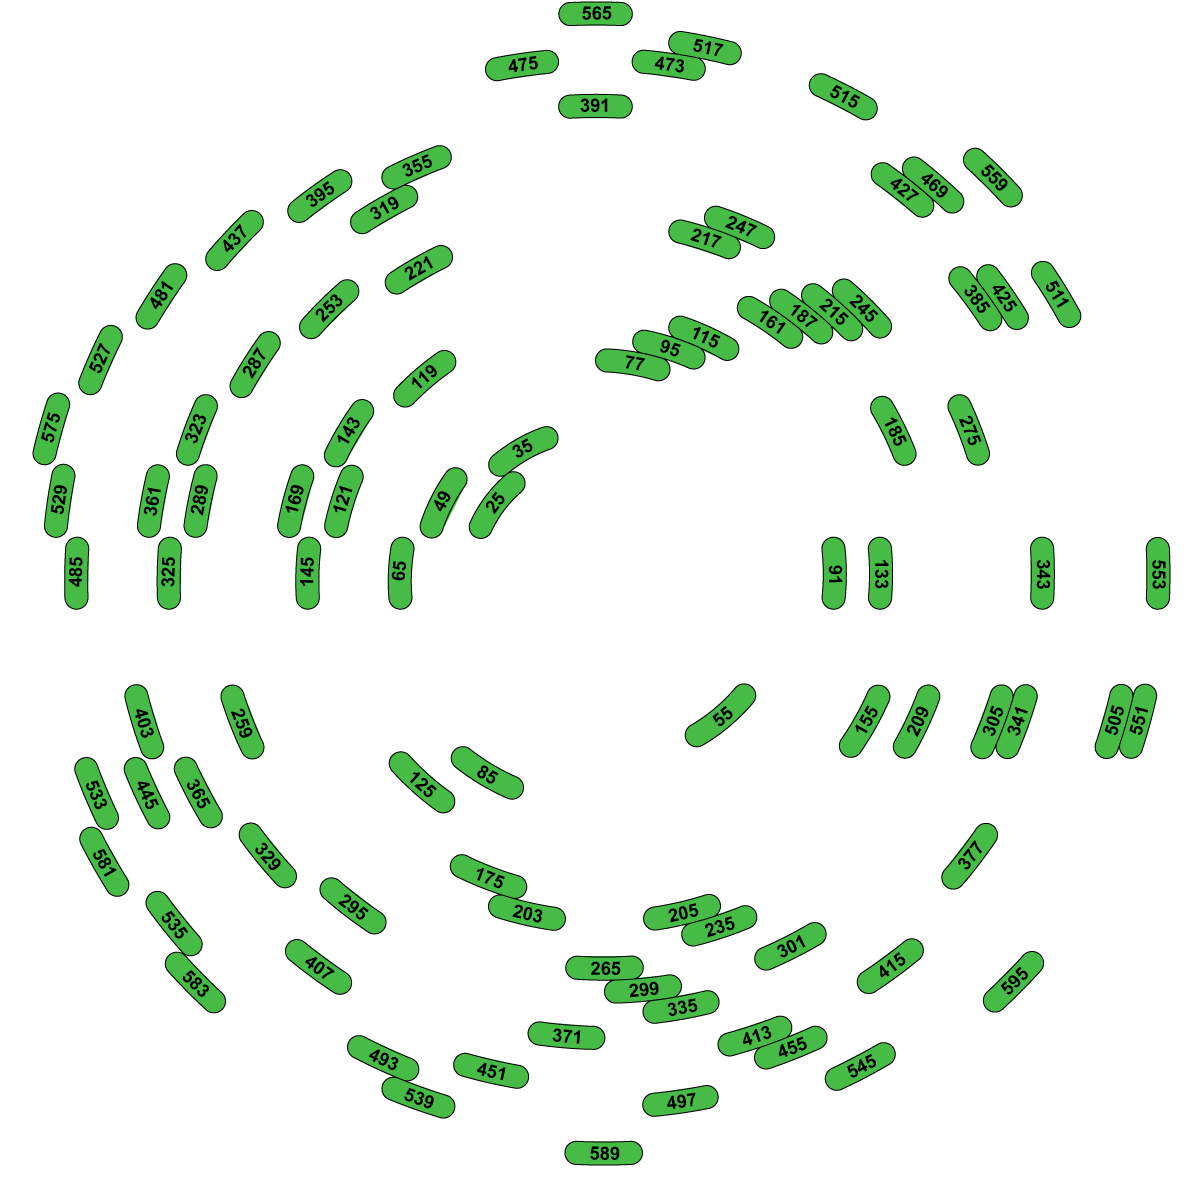 dipolar-spiral-layer3-2021